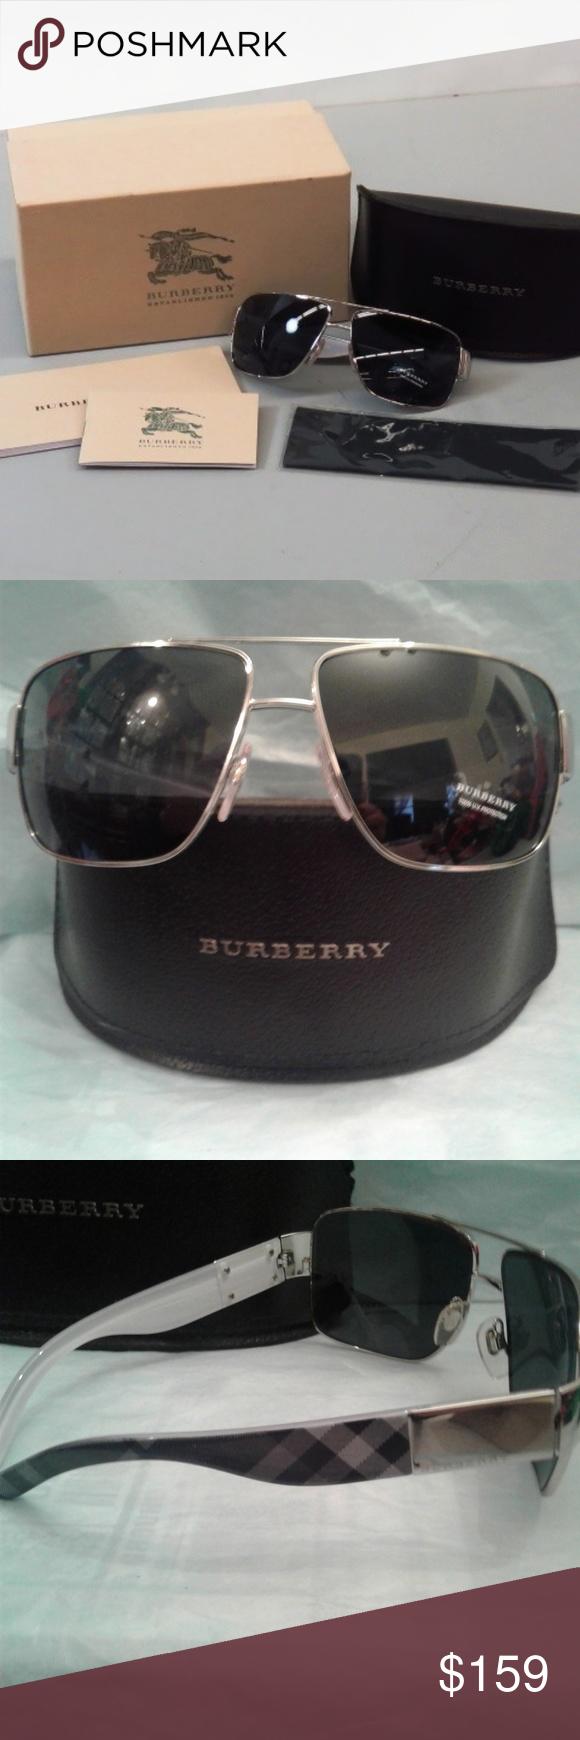 d56aea6f4b7 ⭐NWOT⭐😎Burberry Unisex Sunglasses 😎 ⭐NWOT ⭐😎 Burberry Unisex full gold  tone rim Aviator style sunglasses BE 3040 1005 87😎 Still has original  sticker ...